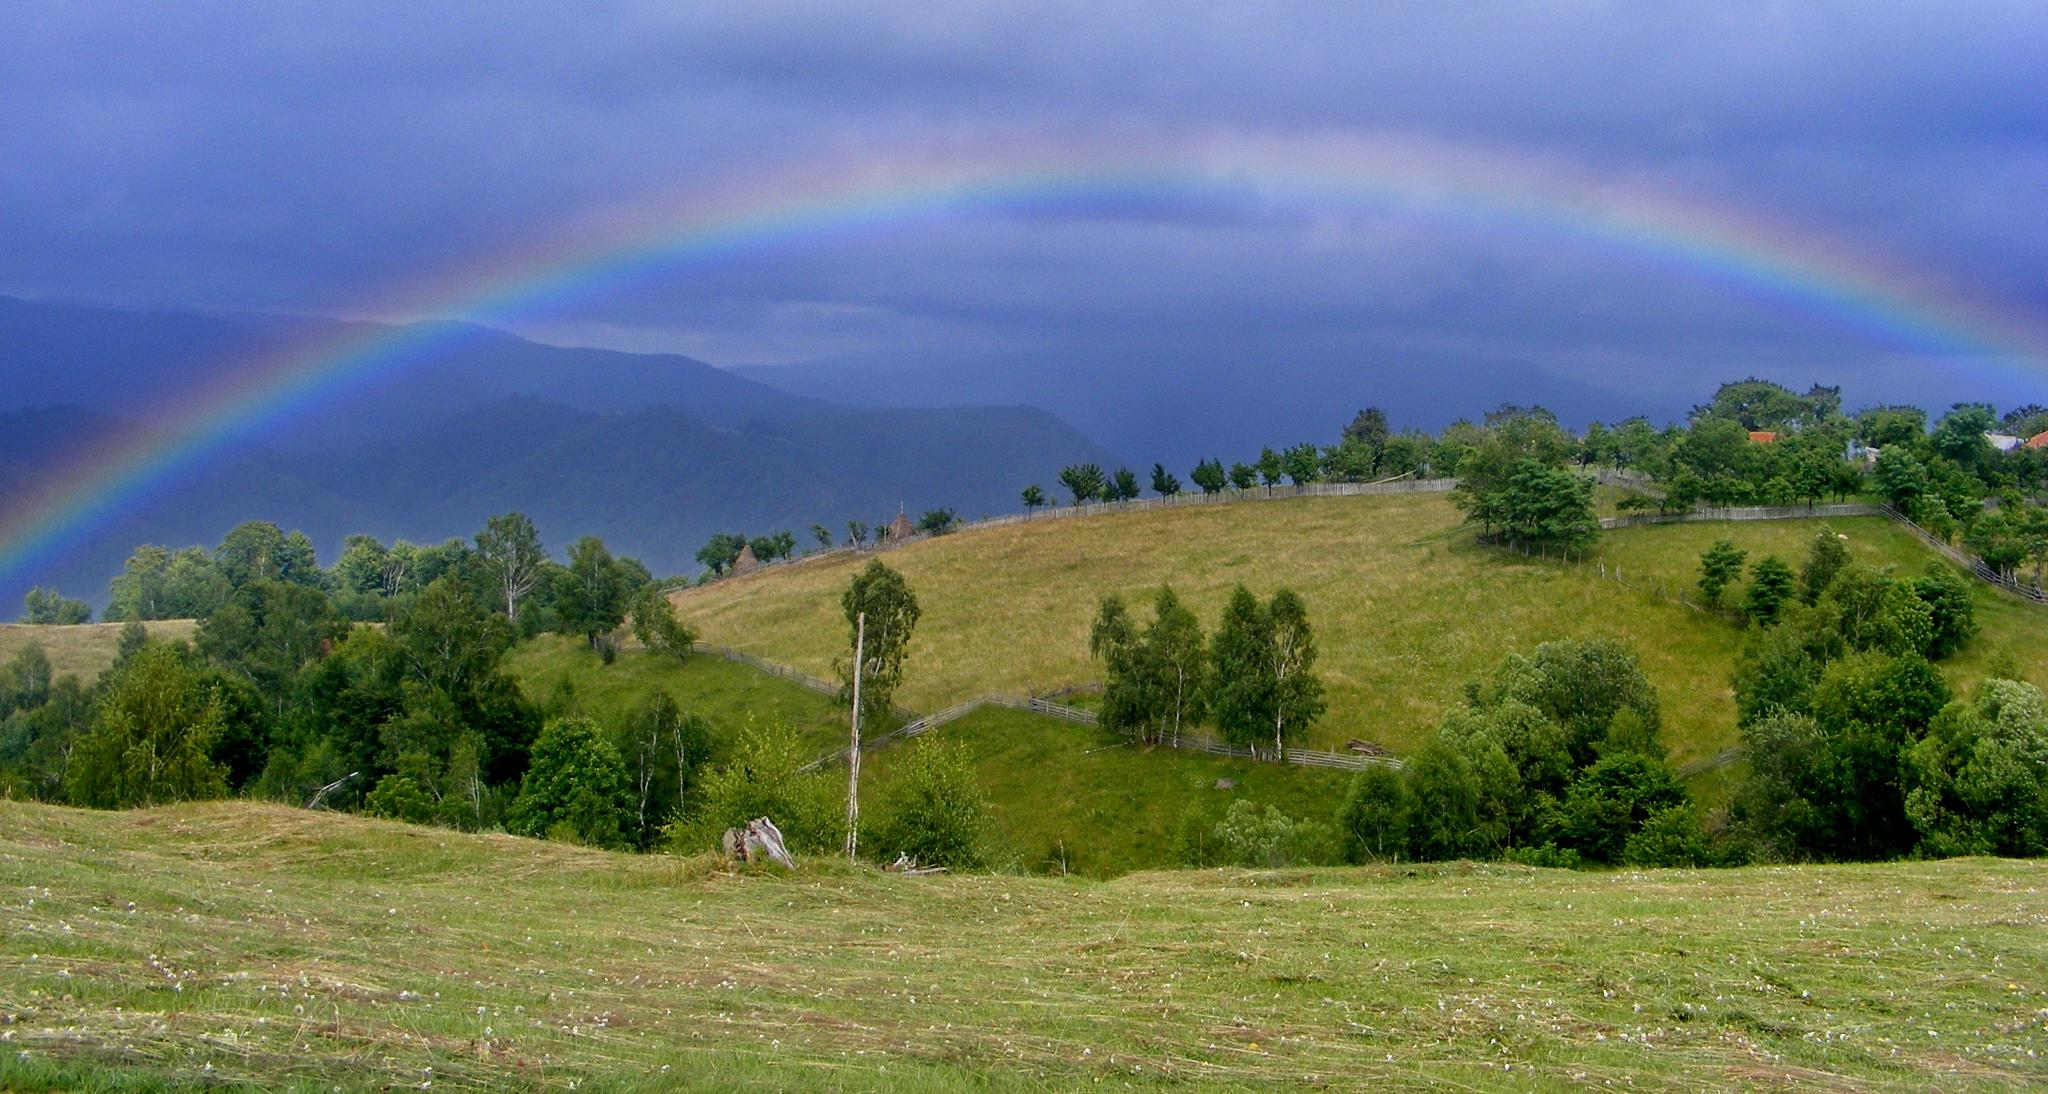 Somewhere...over the rainbow by Irina Carmen Brinza